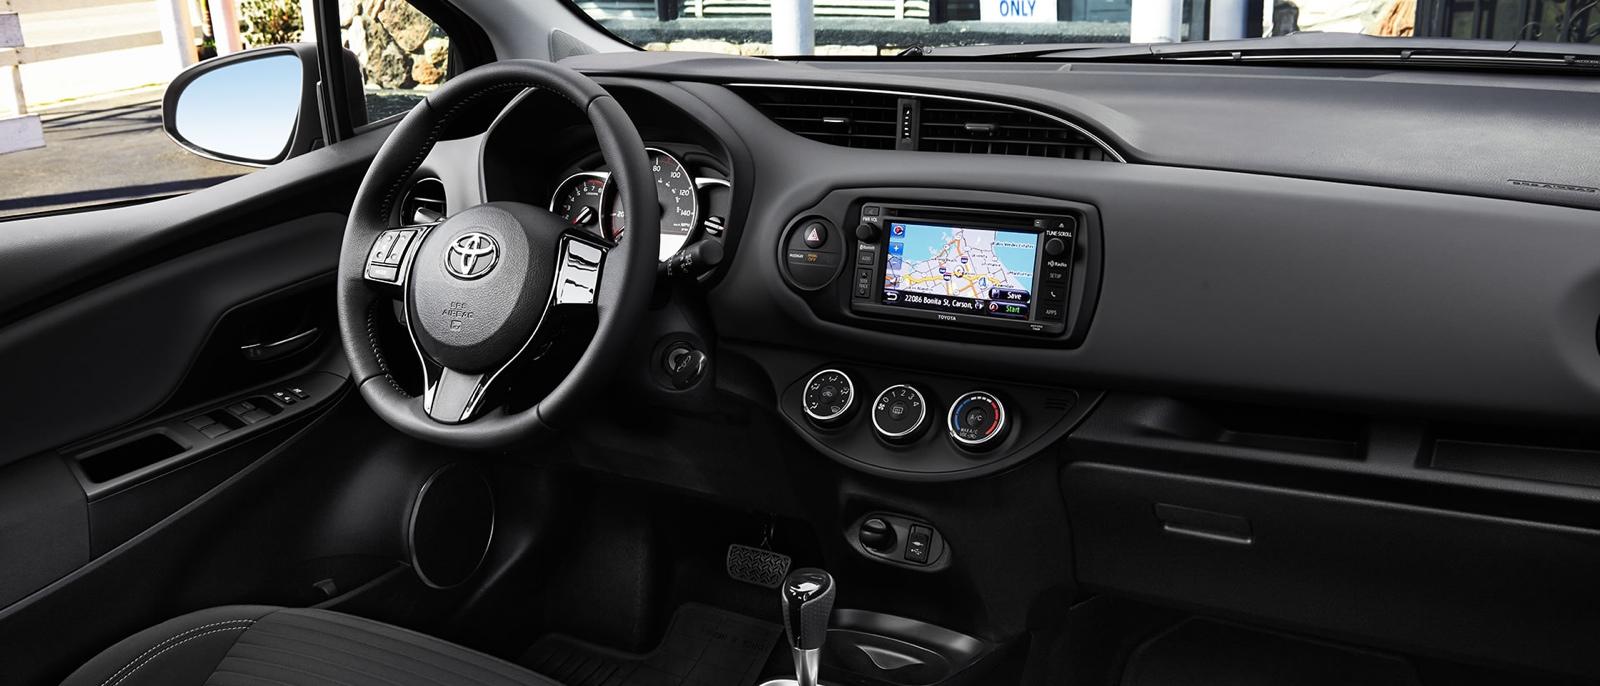 2015 Toyota Yaris Interior